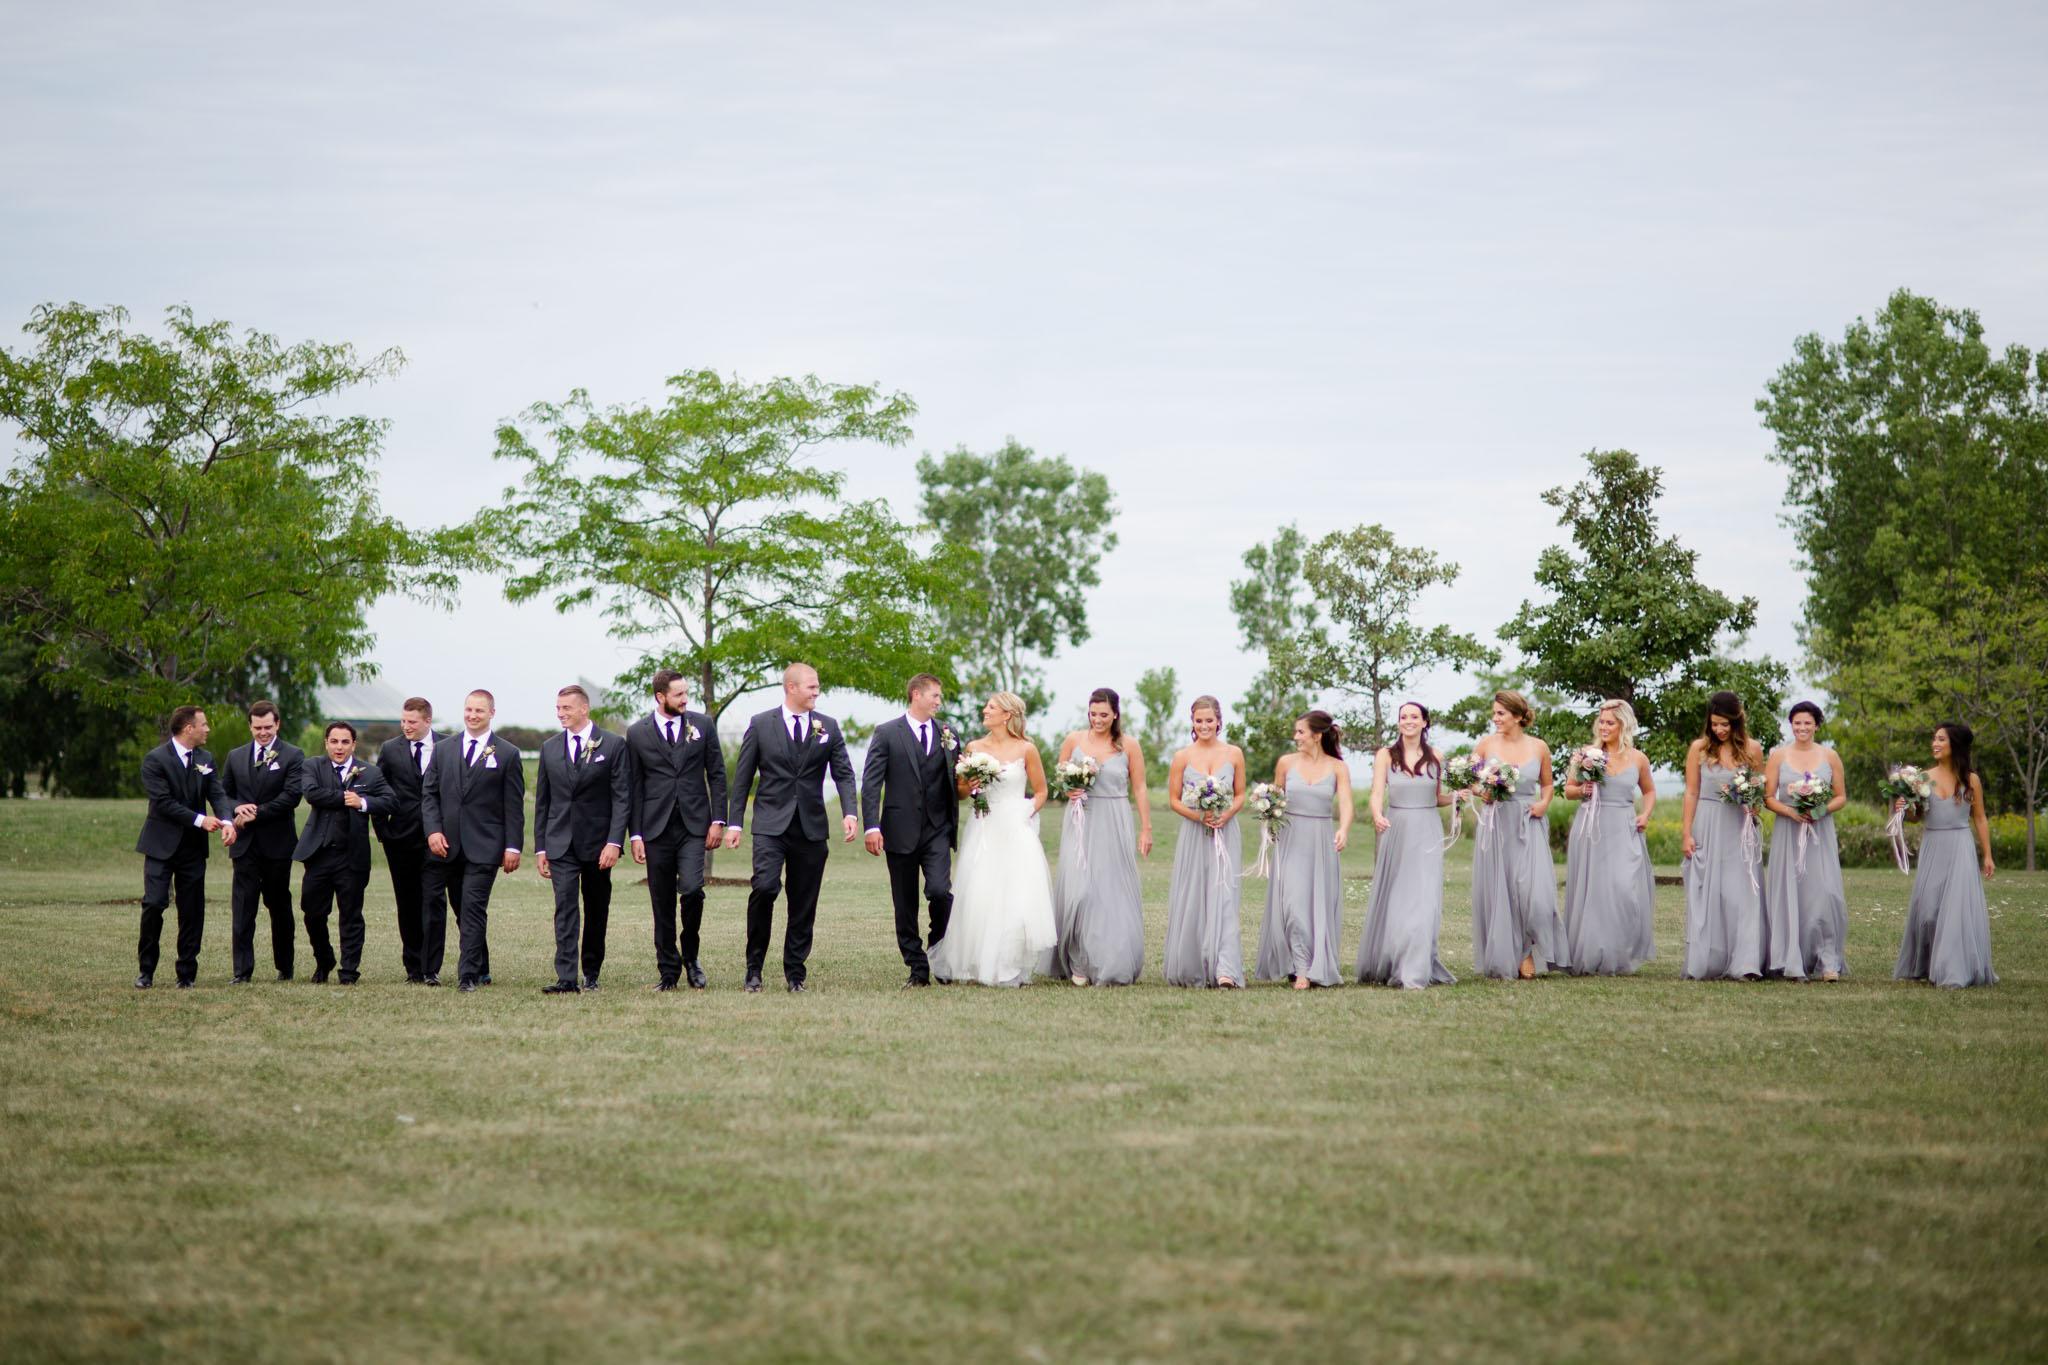 bridgeport-art-center-wedding-photos-8.jpg